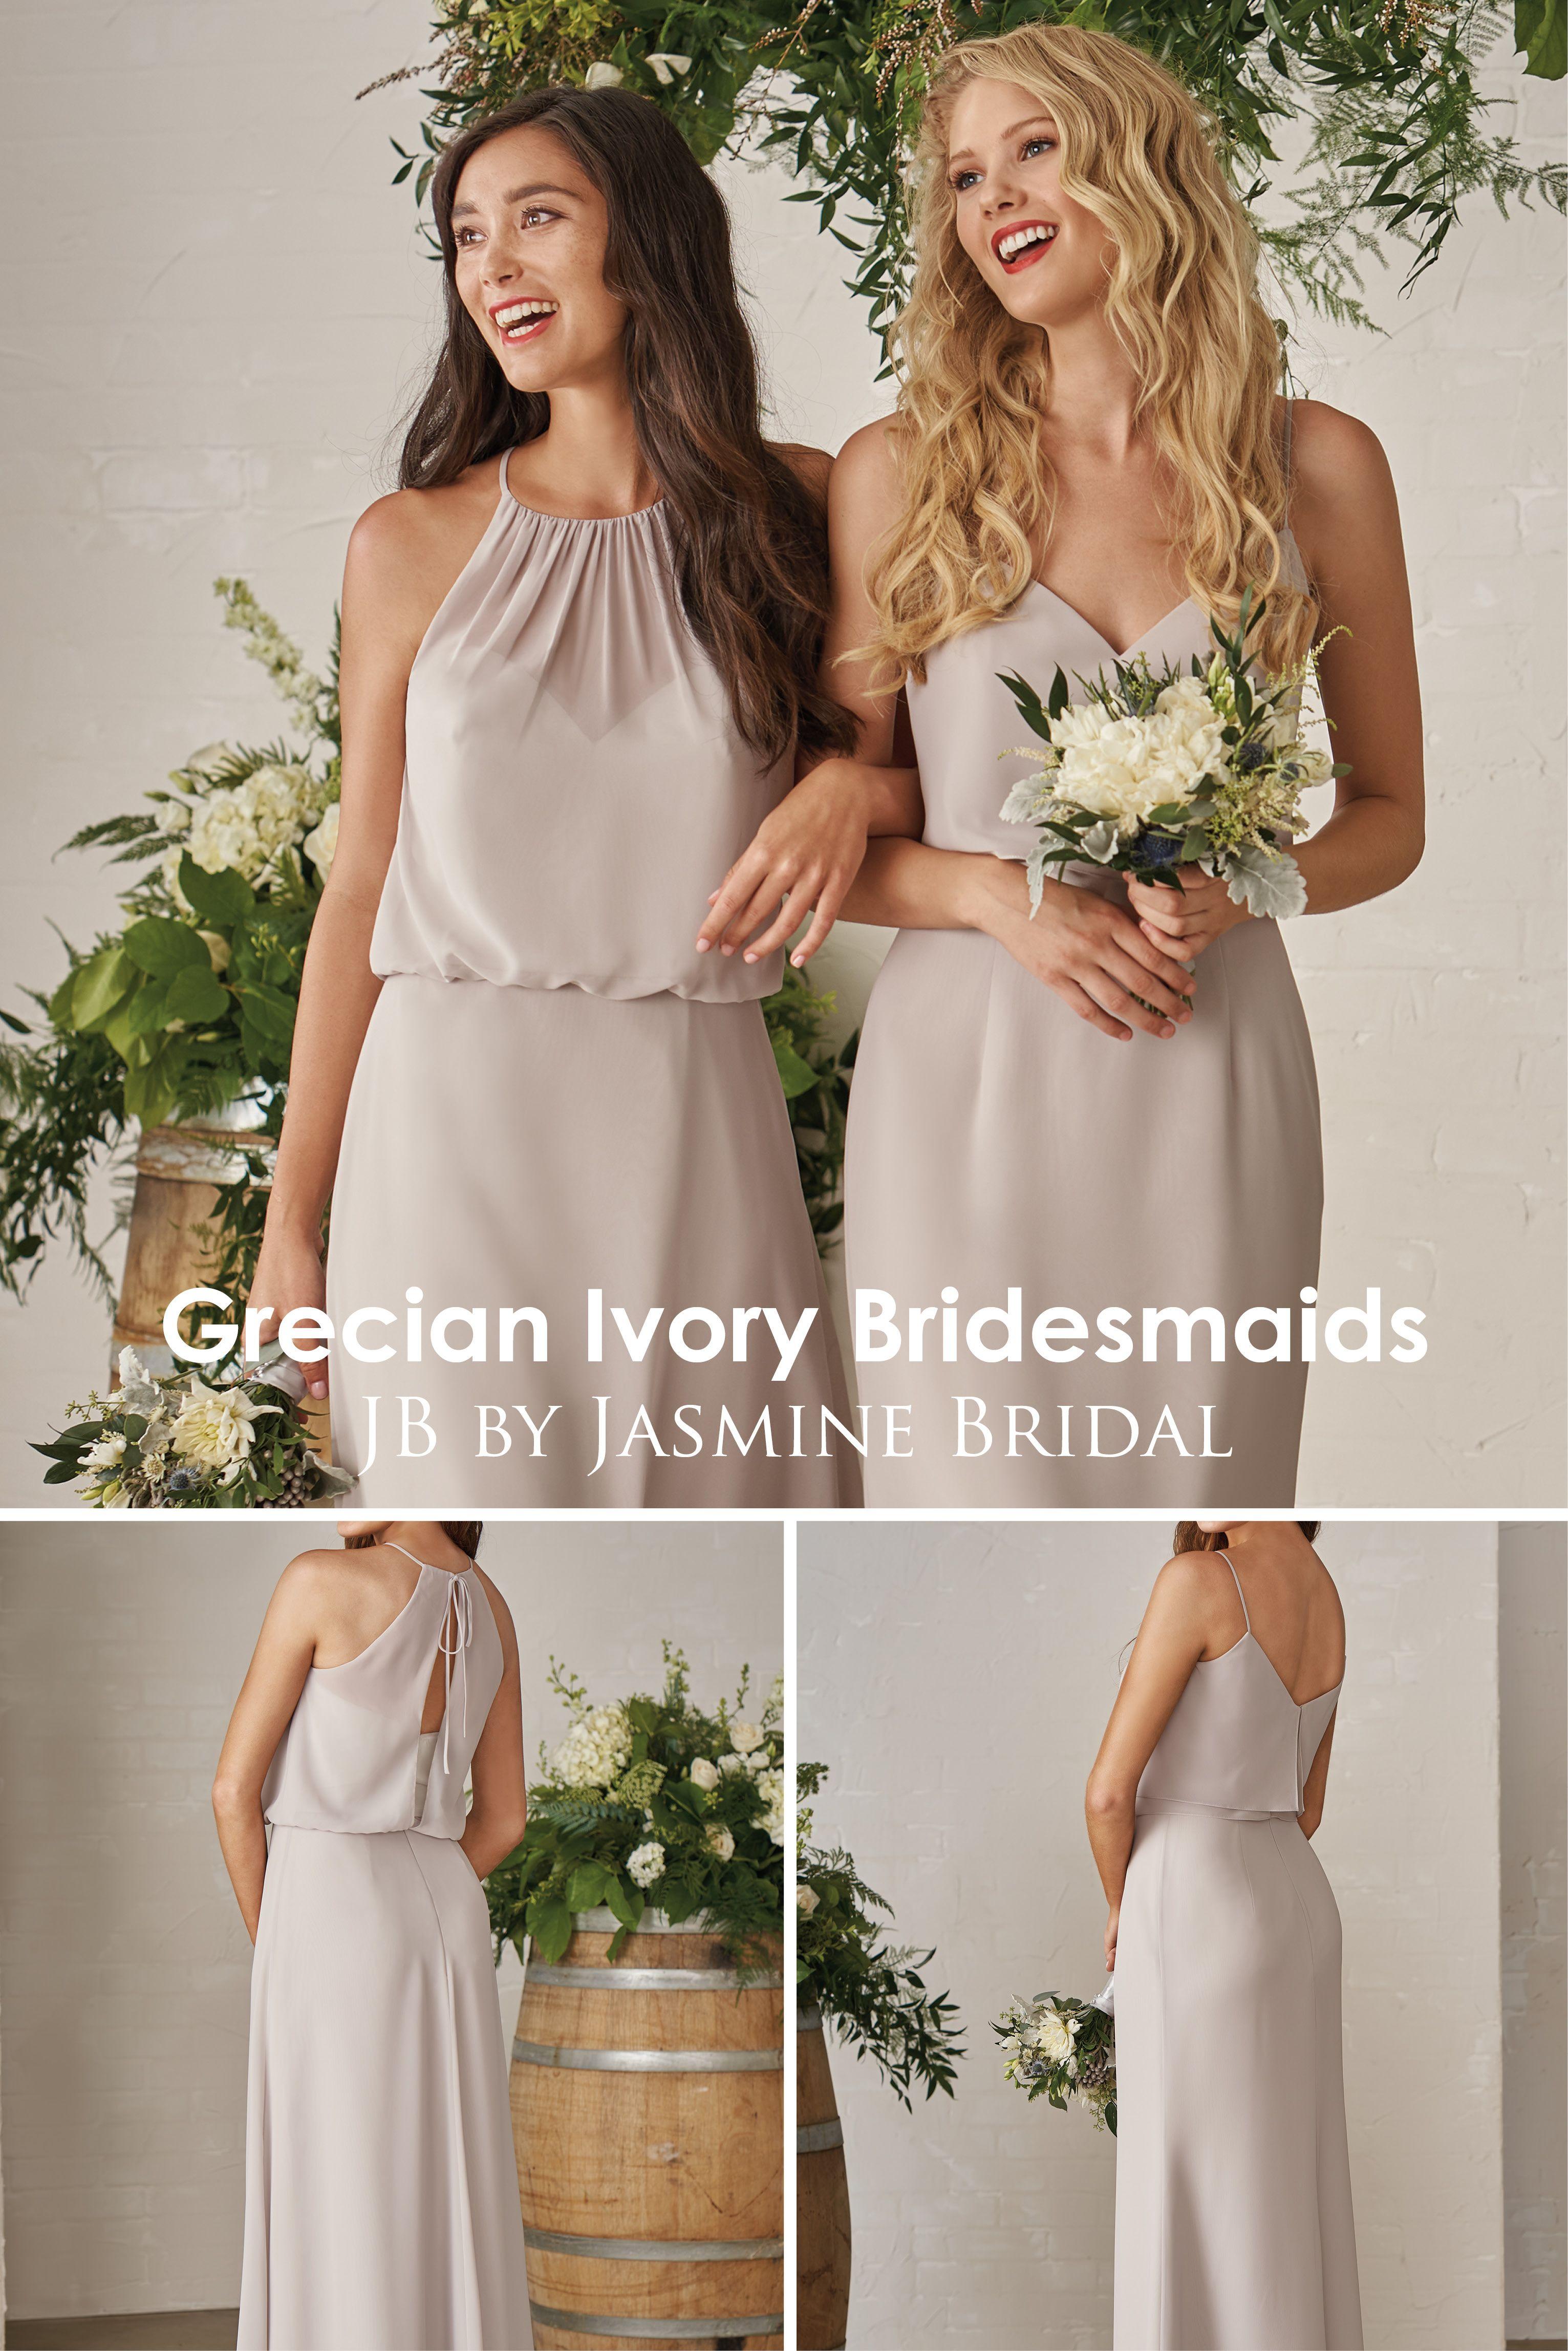 Jasmine Bridal Jb Grecian Ivory Bridesmaids Neutral Bridal Party Simple Bridesmai Grecian Wedding Dress Ivory Bridesmaid Dresses Grecian Bridesmaid Dress